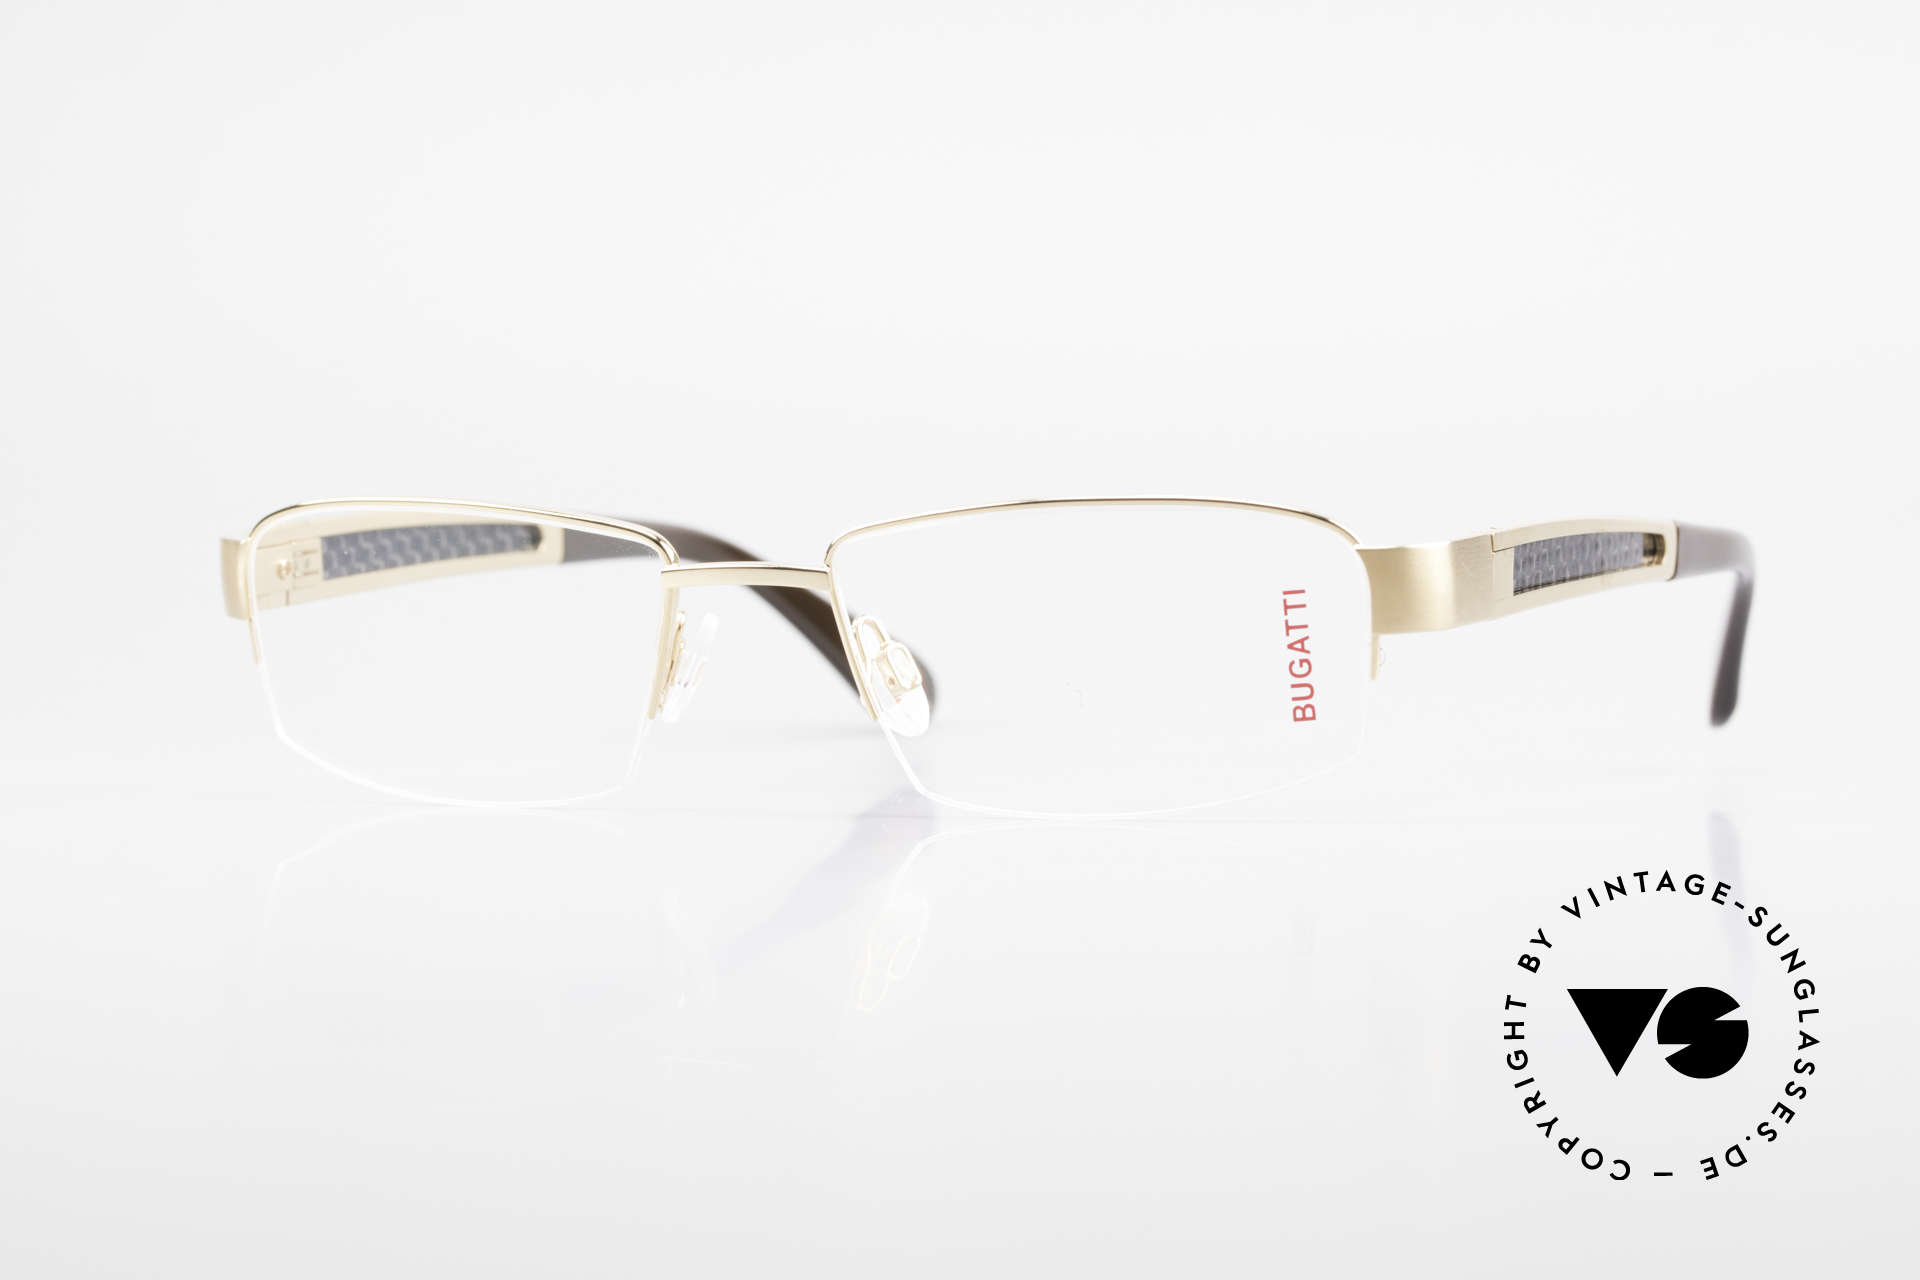 Bugatti 524 Carbon Titanium Gold Frame, BUGATTI luxury eyeglasses of incredible top-quality, Made for Men